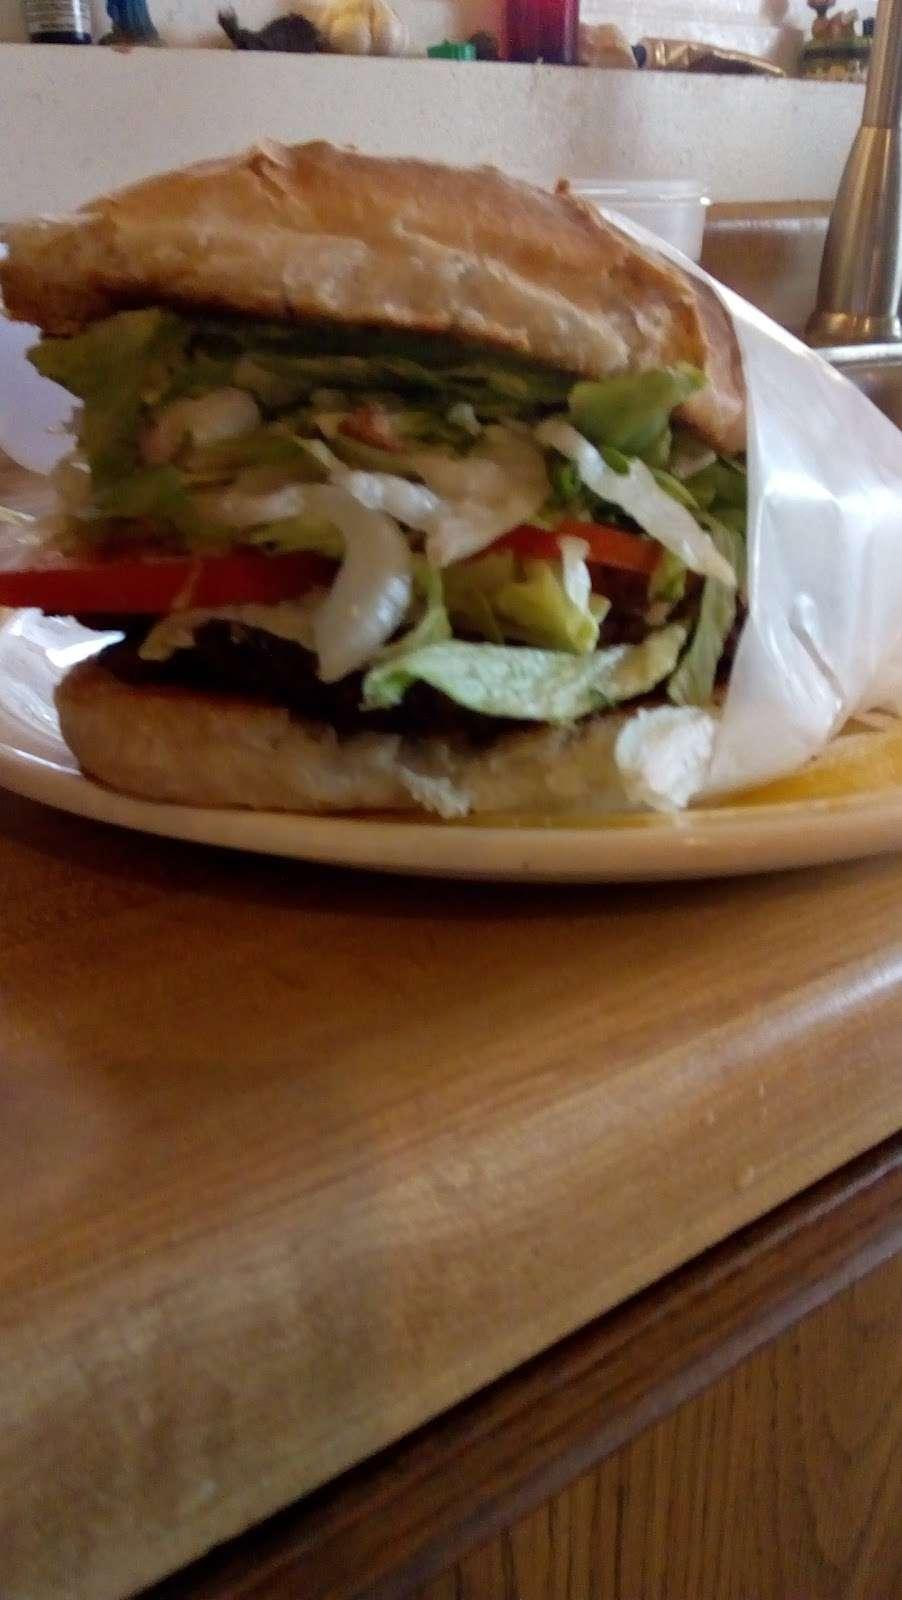 Tortas Juniors - restaurant    Photo 7 of 18   Address: Atenas #3751, Playas, Costa Azul, 22506 Tijuana, B.C., Mexico   Phone: 664 558 1585